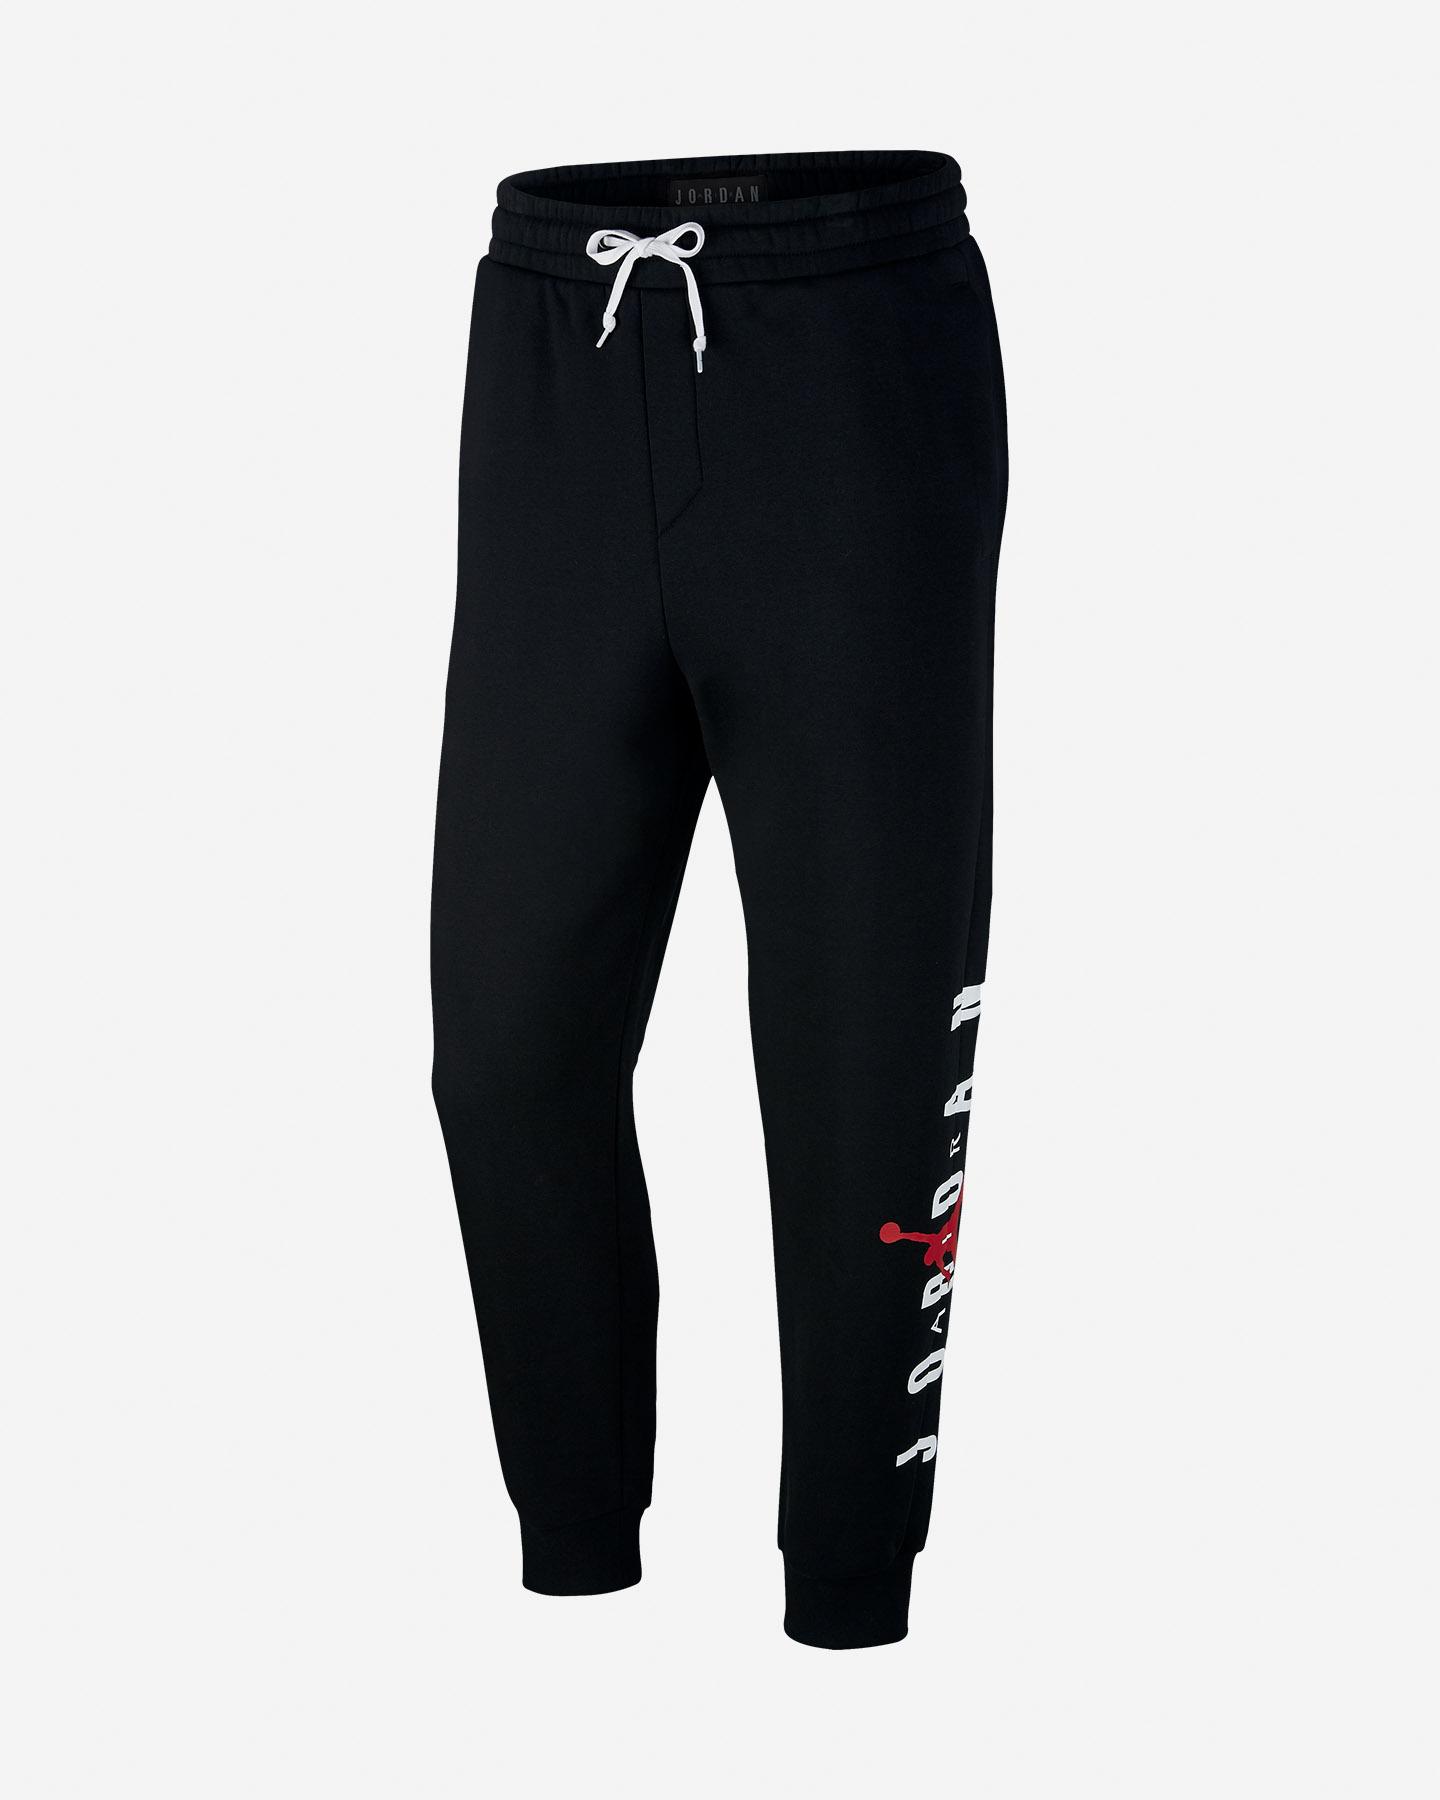 Abbigliamento Basket Nike Jordan Jump Air Gfx Fleece M AA1454-010